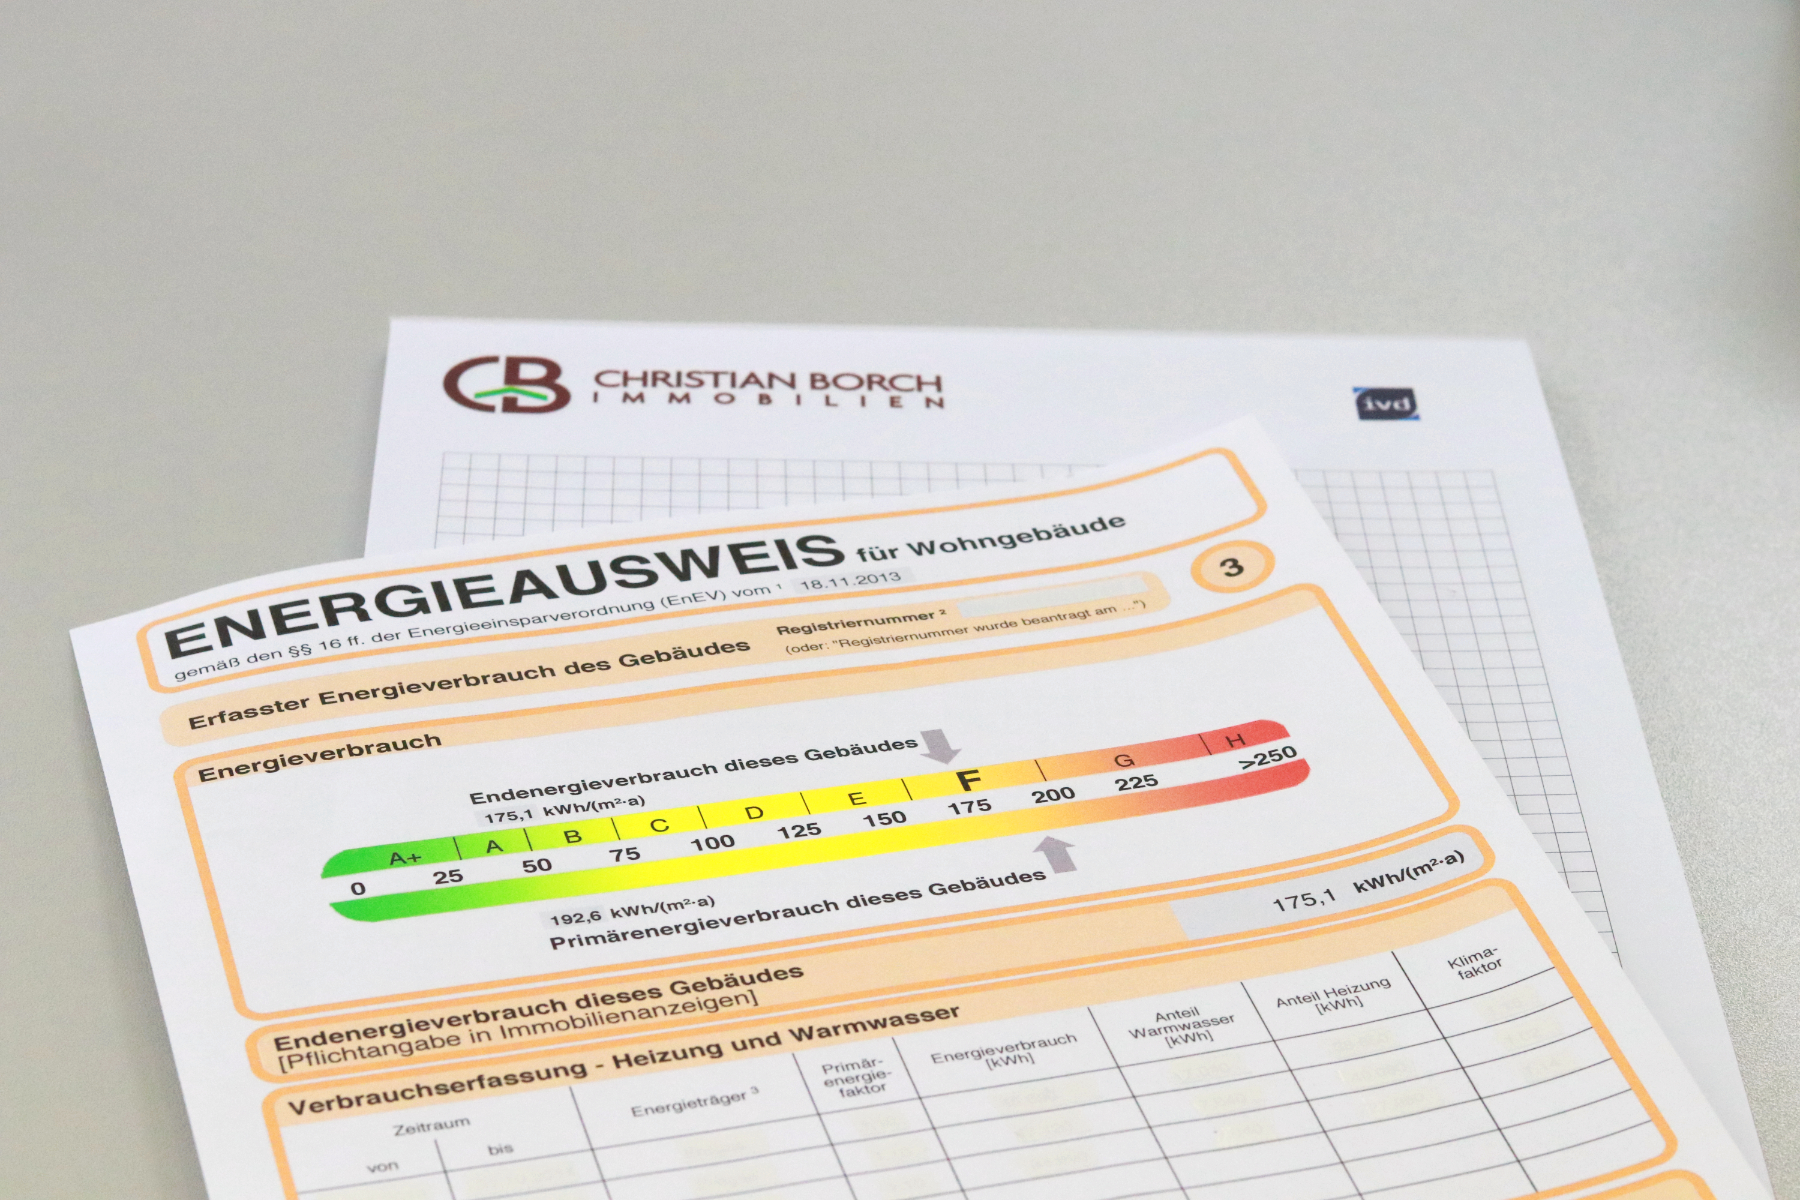 Energieausweis von Immobilien Christian Borch